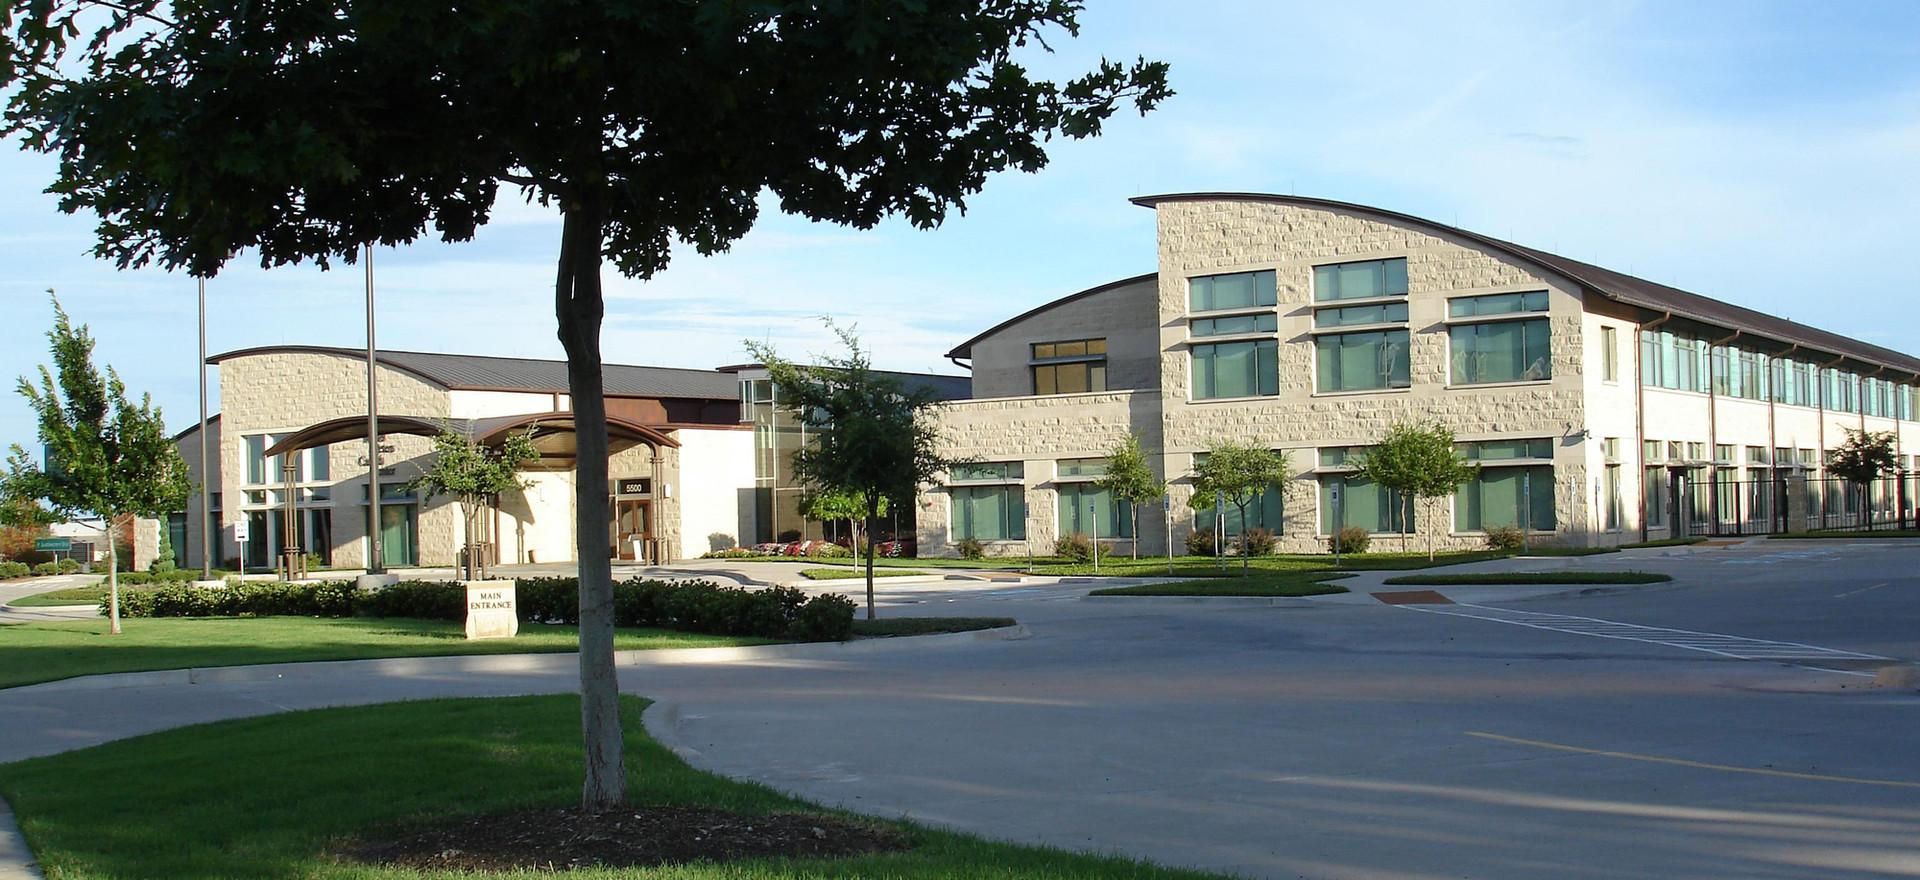 Communities Foundation of TX Headquarters